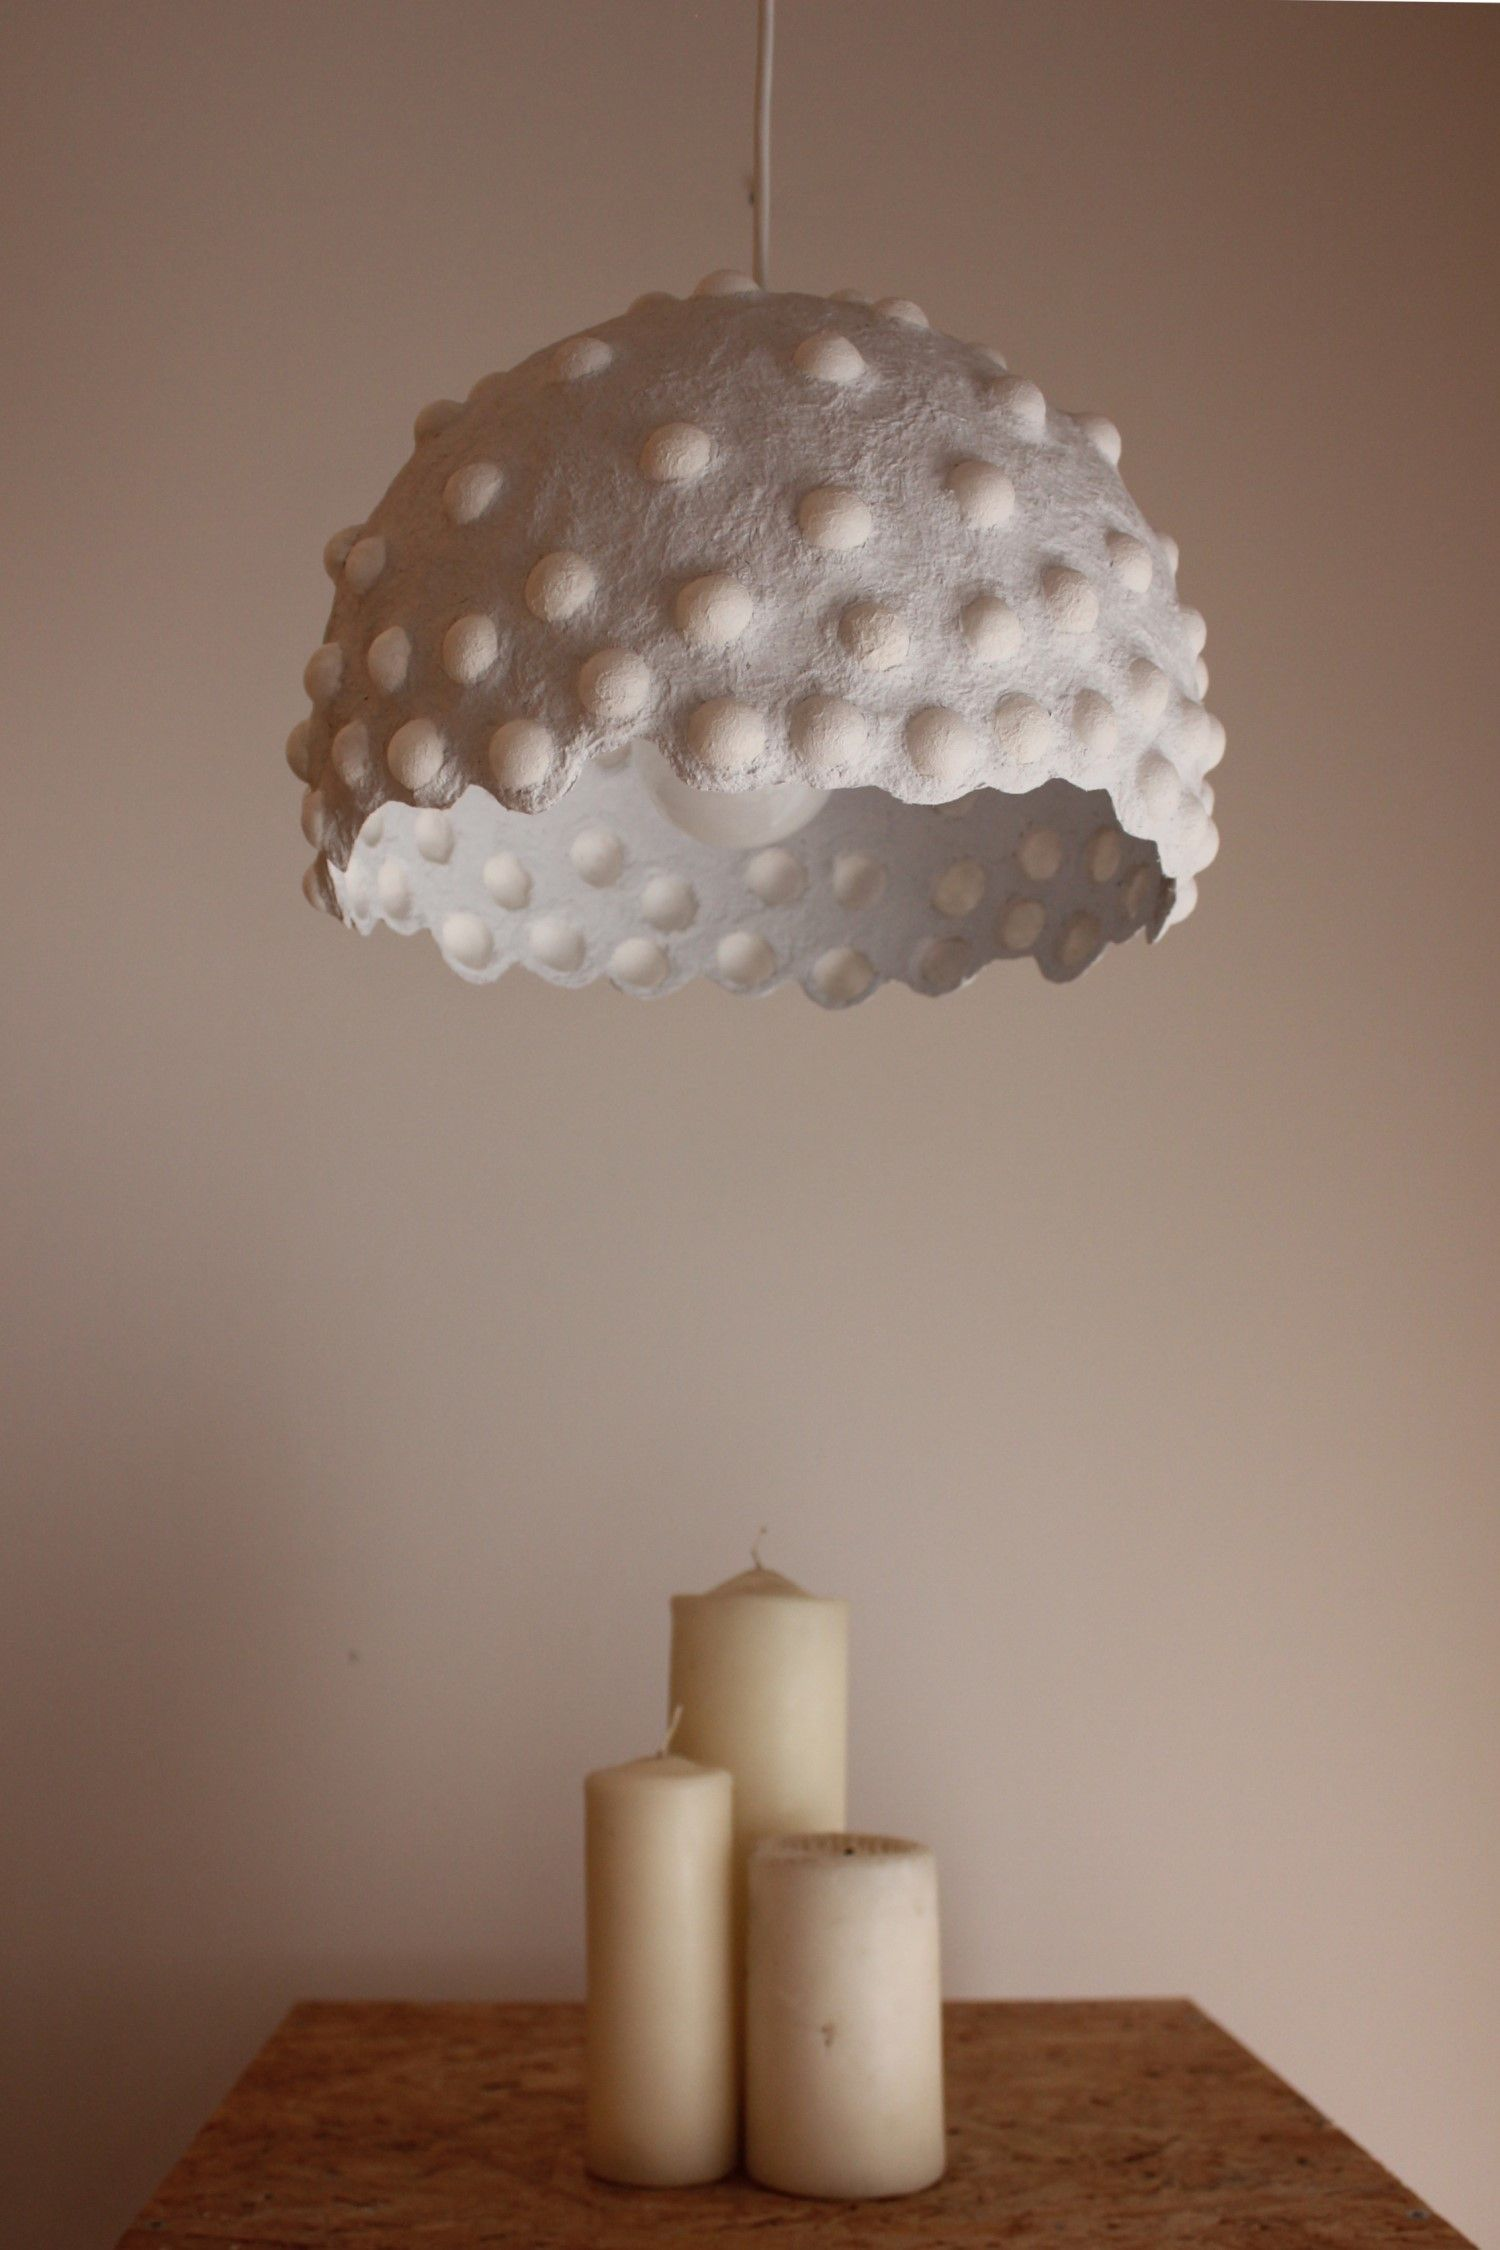 Paper Mache Pendant Light Recycled Paper Lampshade Paper Pulp Light Translucent Paper Light Hanging Lamp 30 Cm 12 Inches Diameter Diy Pendant Light Paper Lampshade Paper Light